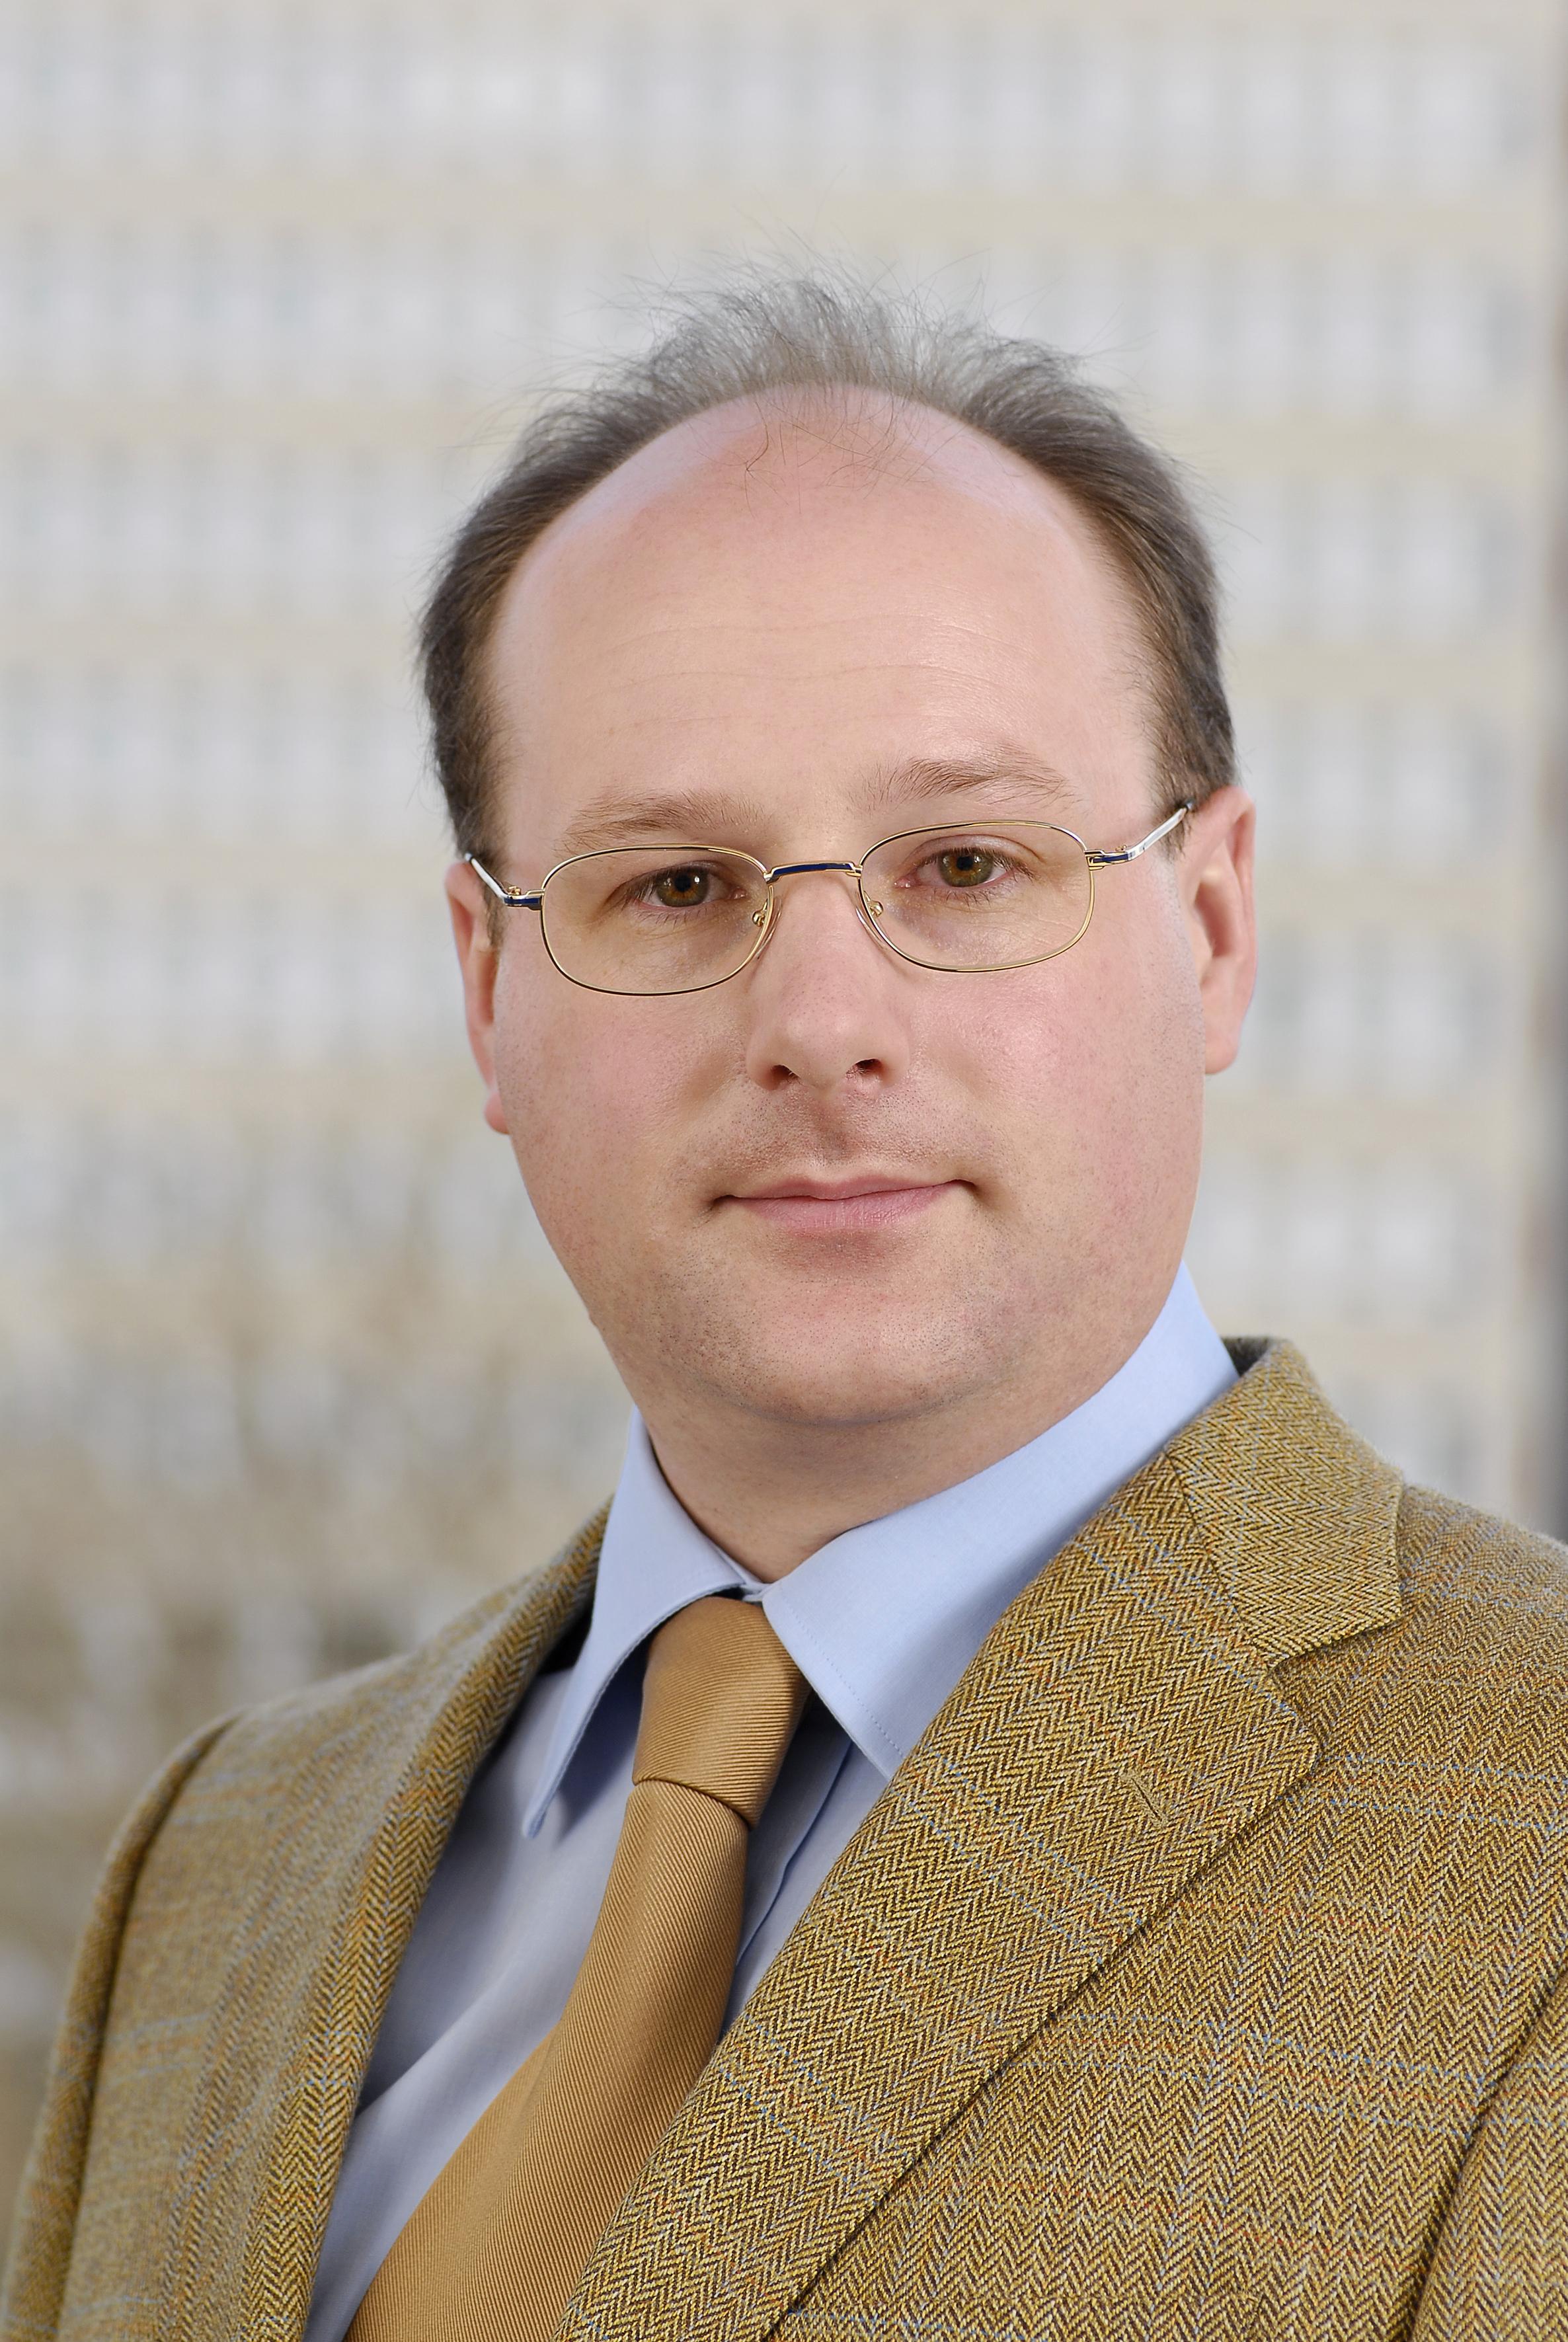 Dr. Niels Lepperhoff